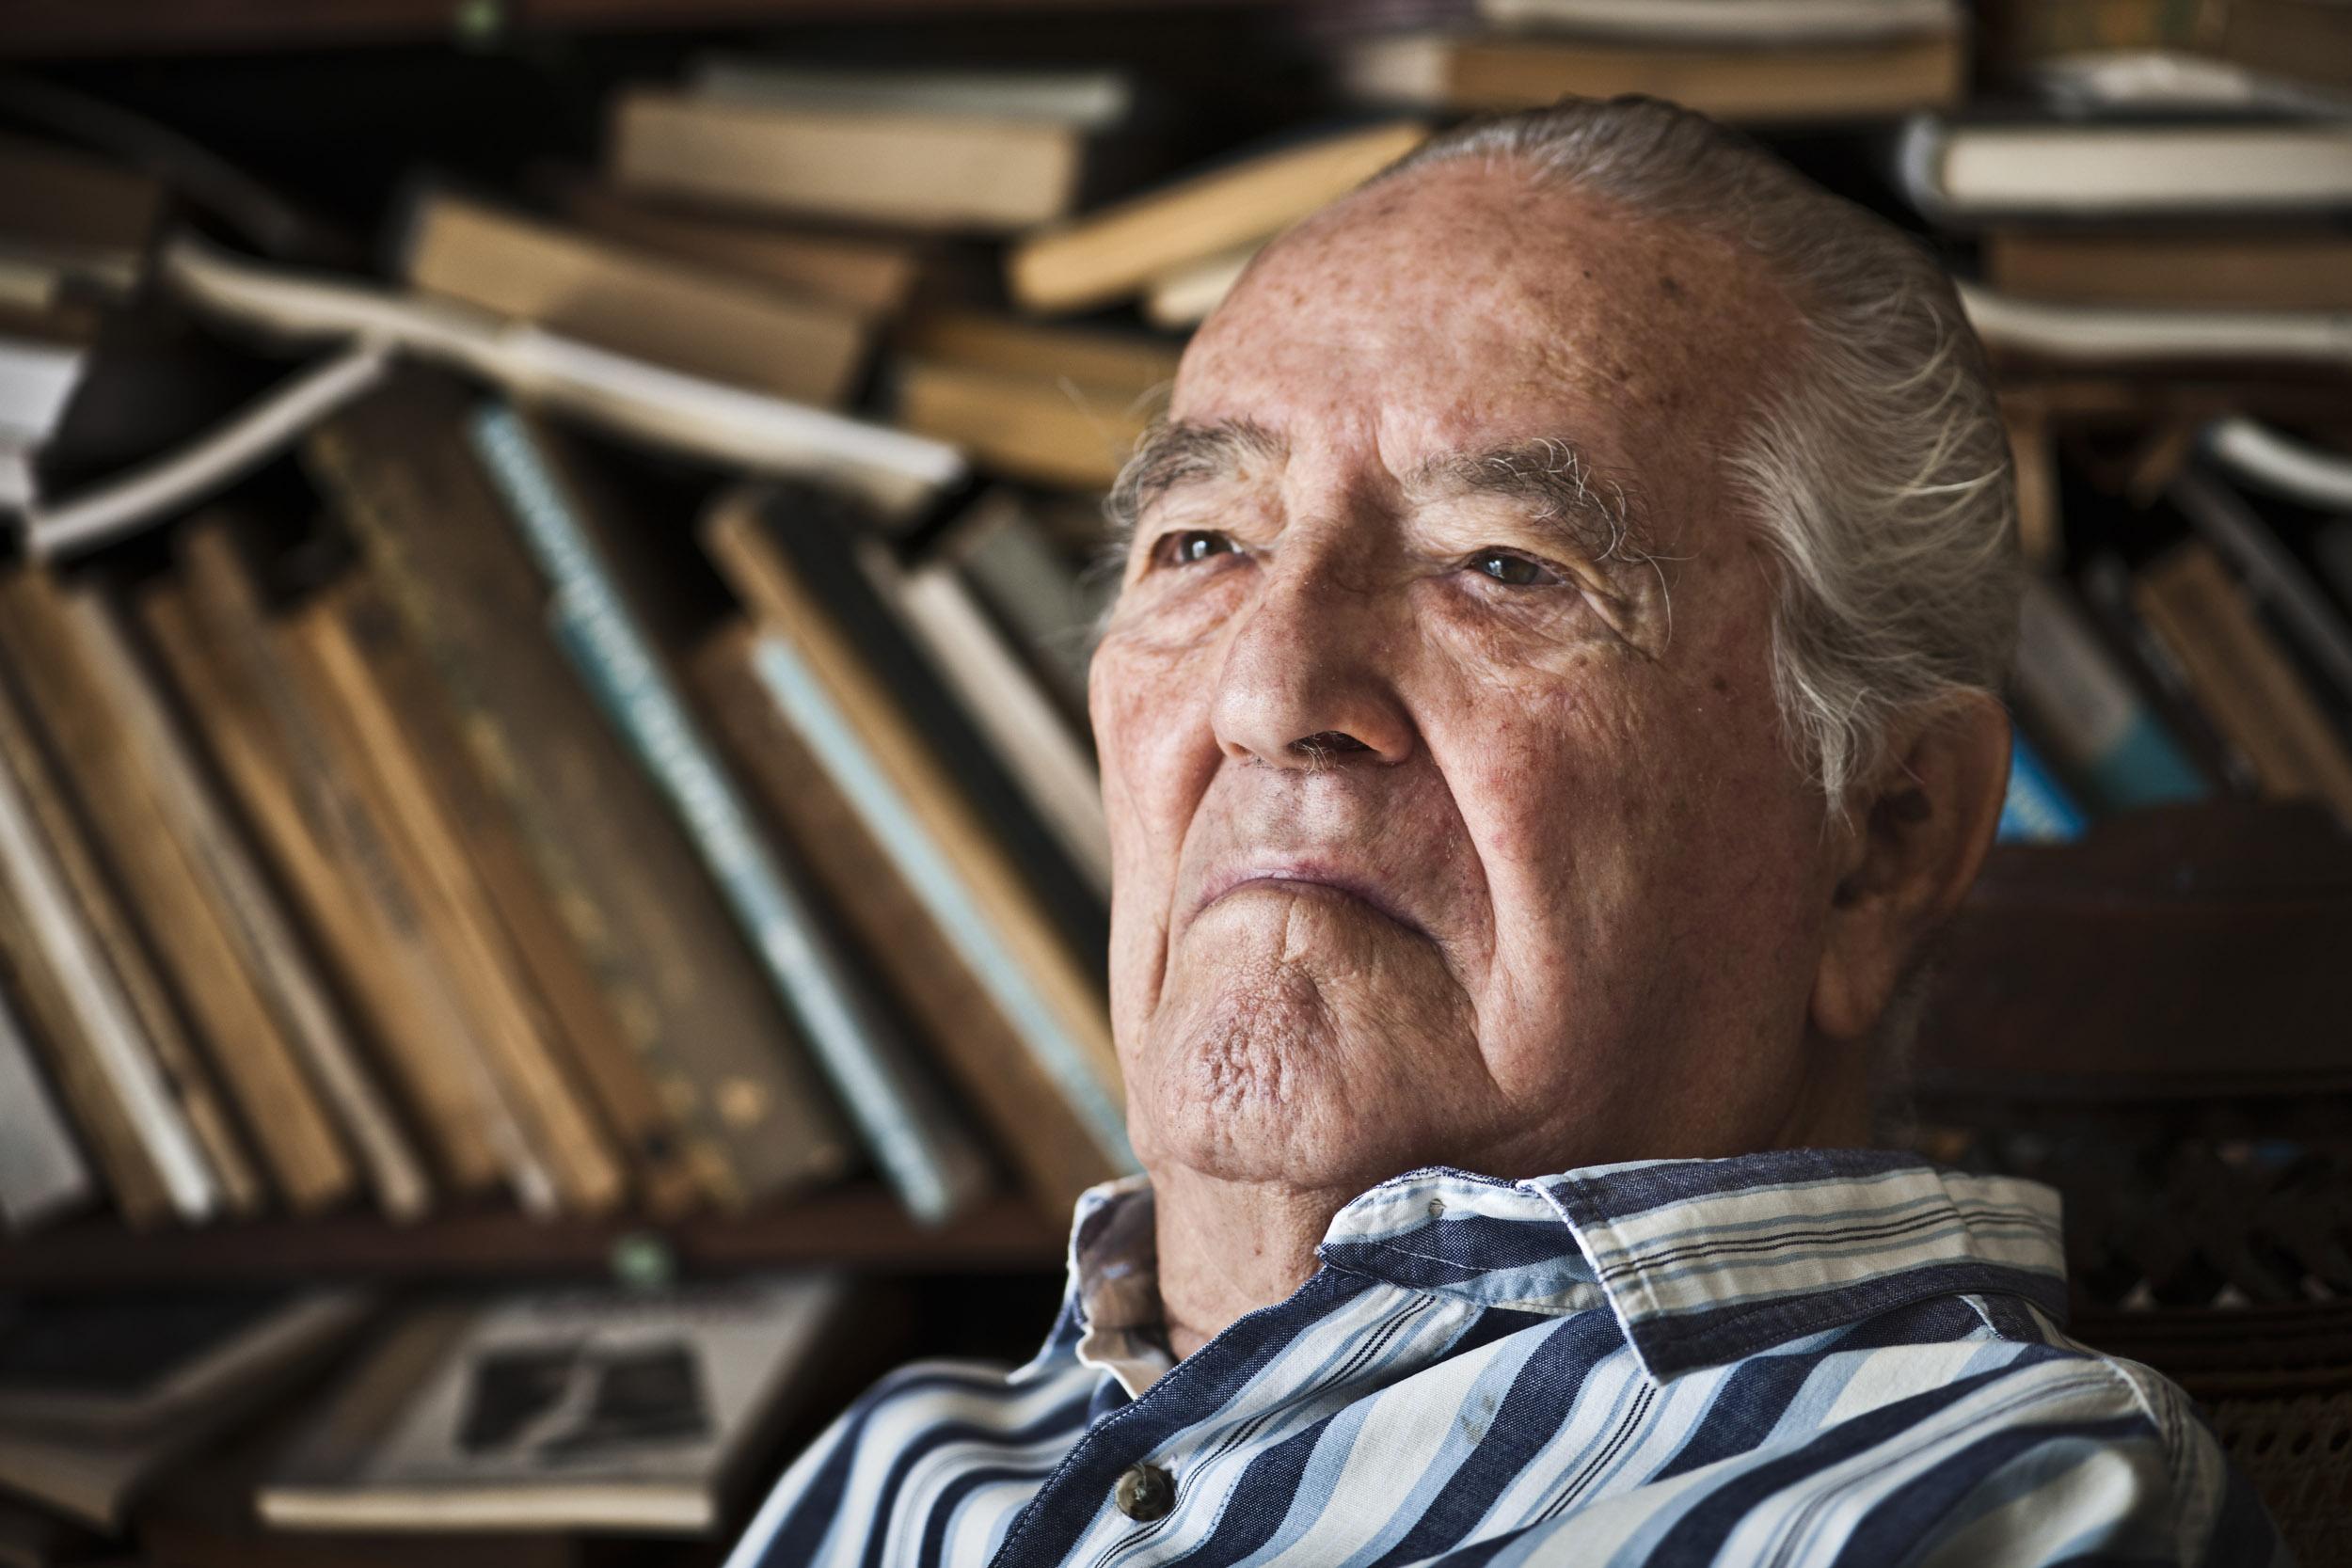 Jaime Zarusky, writer - Illuminated Cuba - Hector Garrido, Aerial and human photography